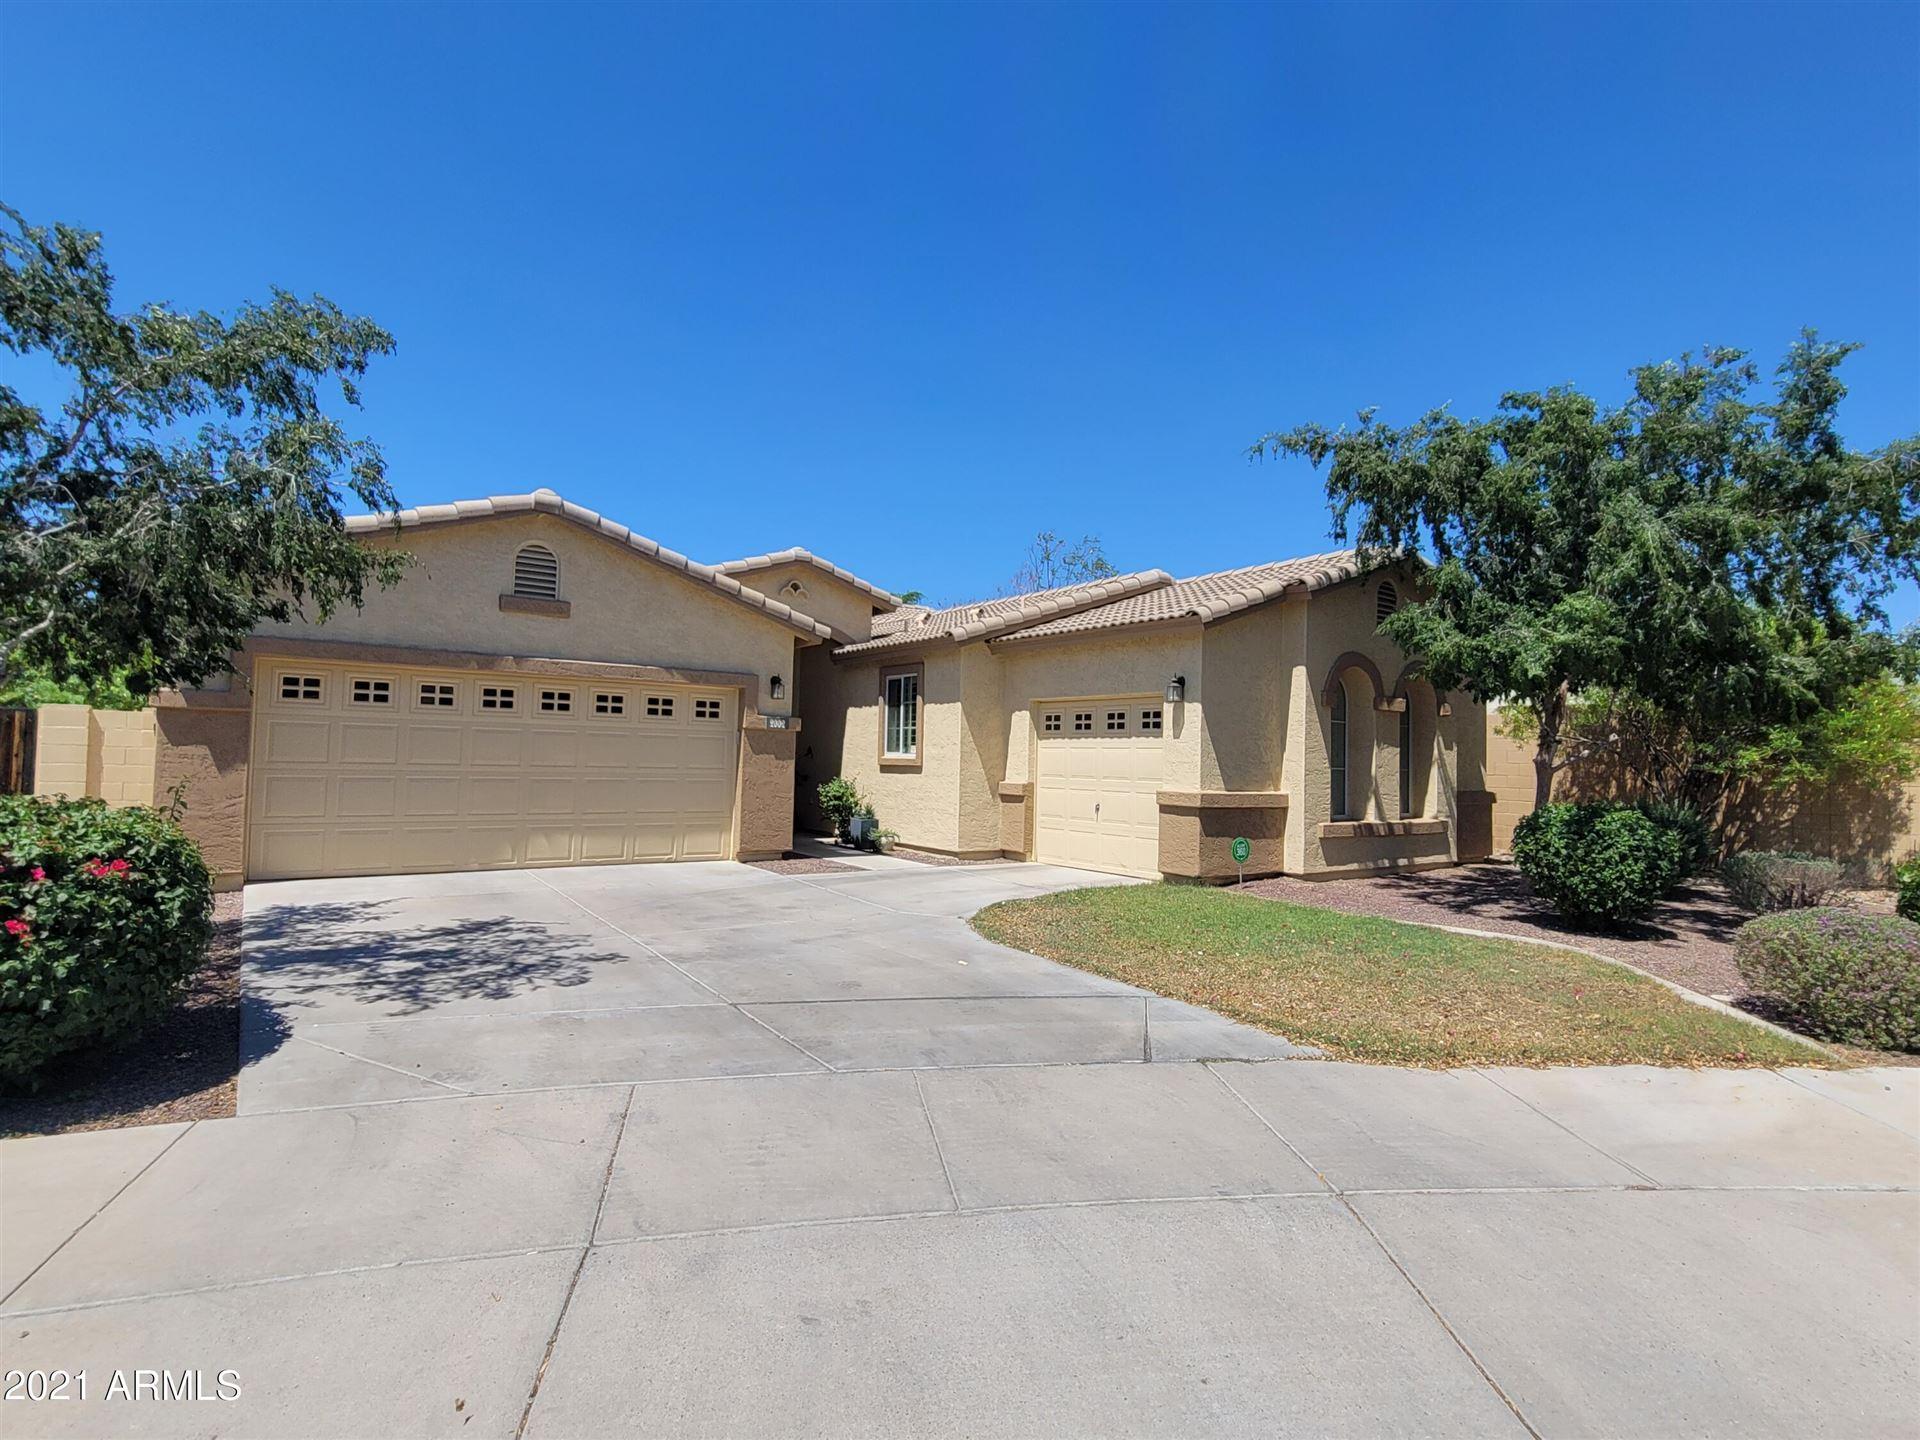 2002 W CARSON Road, Phoenix, AZ 85041 - MLS#: 6246772